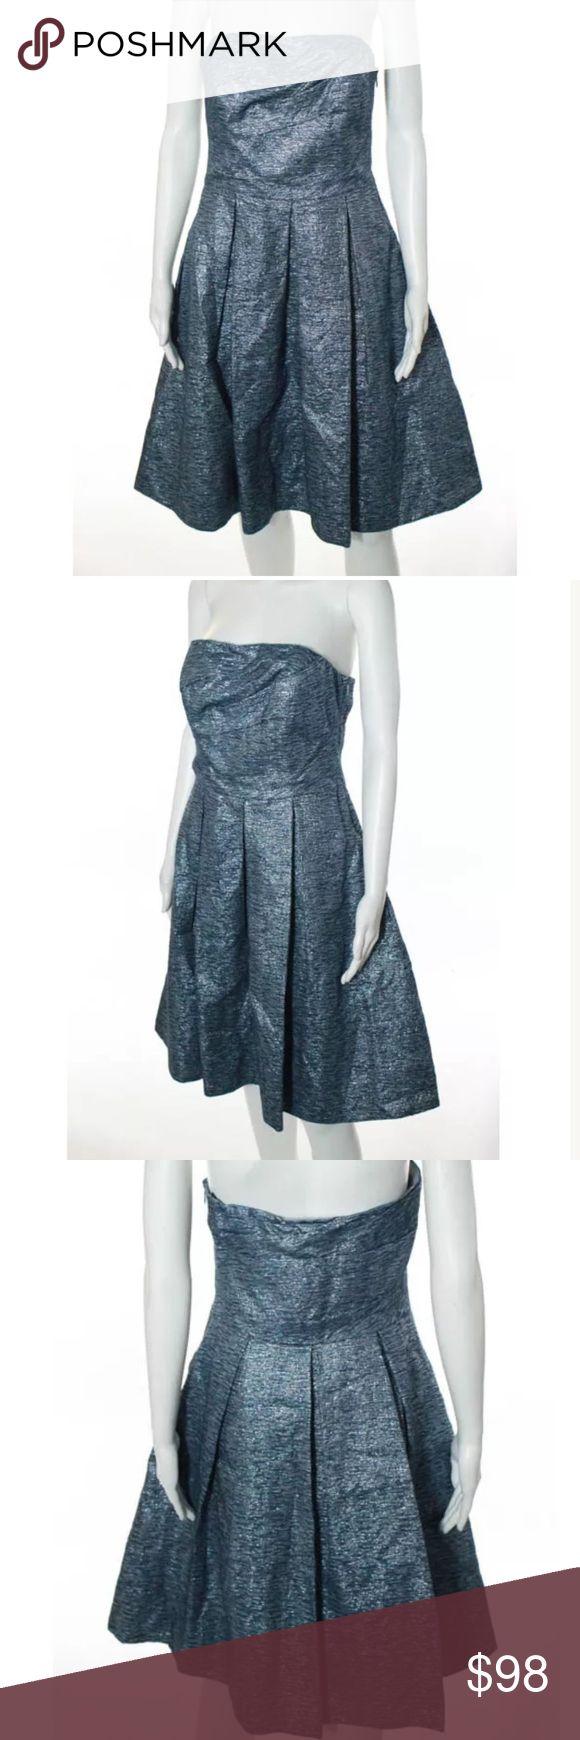 David Meister taffeta blue strapless dress Sz 6 Blue strapless taffeta dress David Meister Dresses Strapless